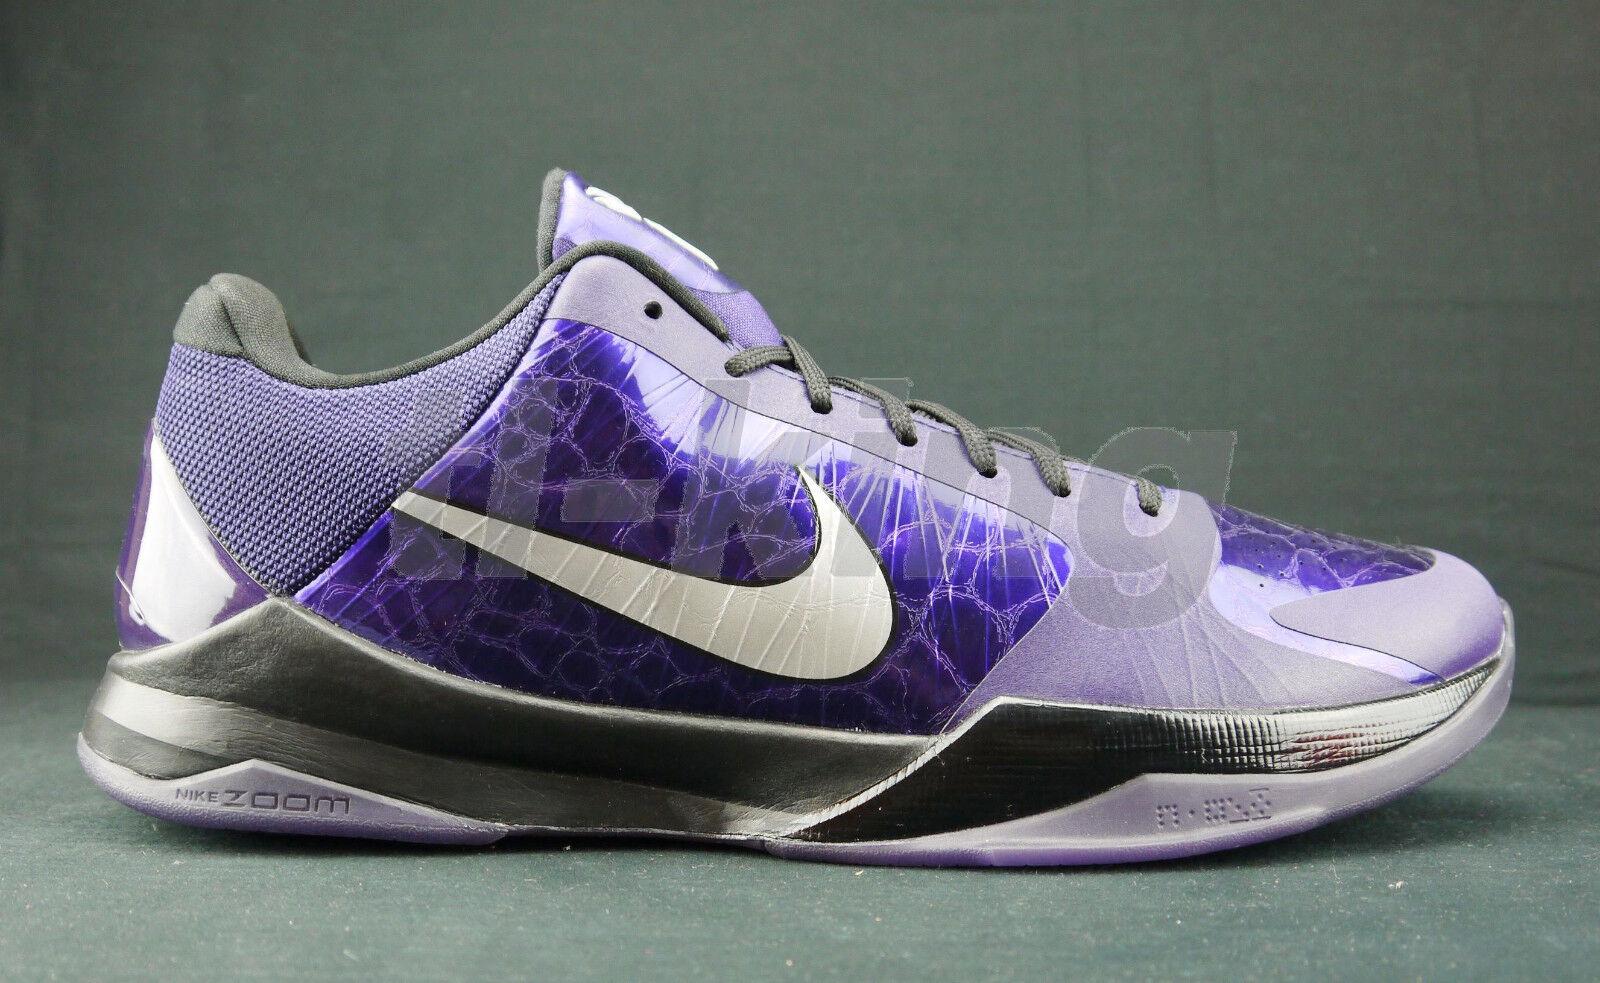 on sale 9181d f7be2 Nike Kobe 5 V Ink Purple House Of Hoops NYC NYC NYC PE player display sz 14  d38184